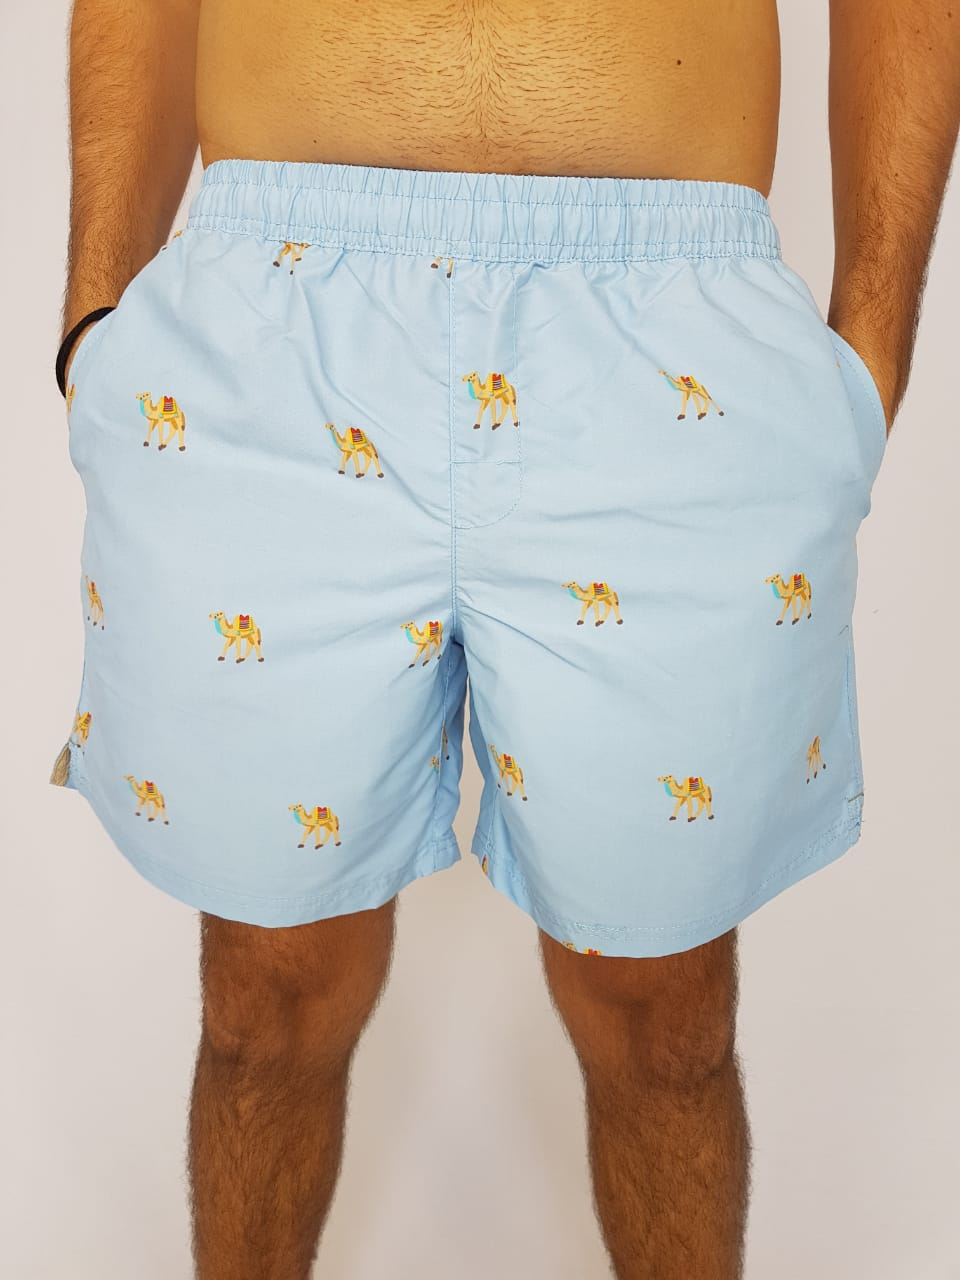 Shorts Masculino Estampado Camelo YachtMaster  - Pick Tita